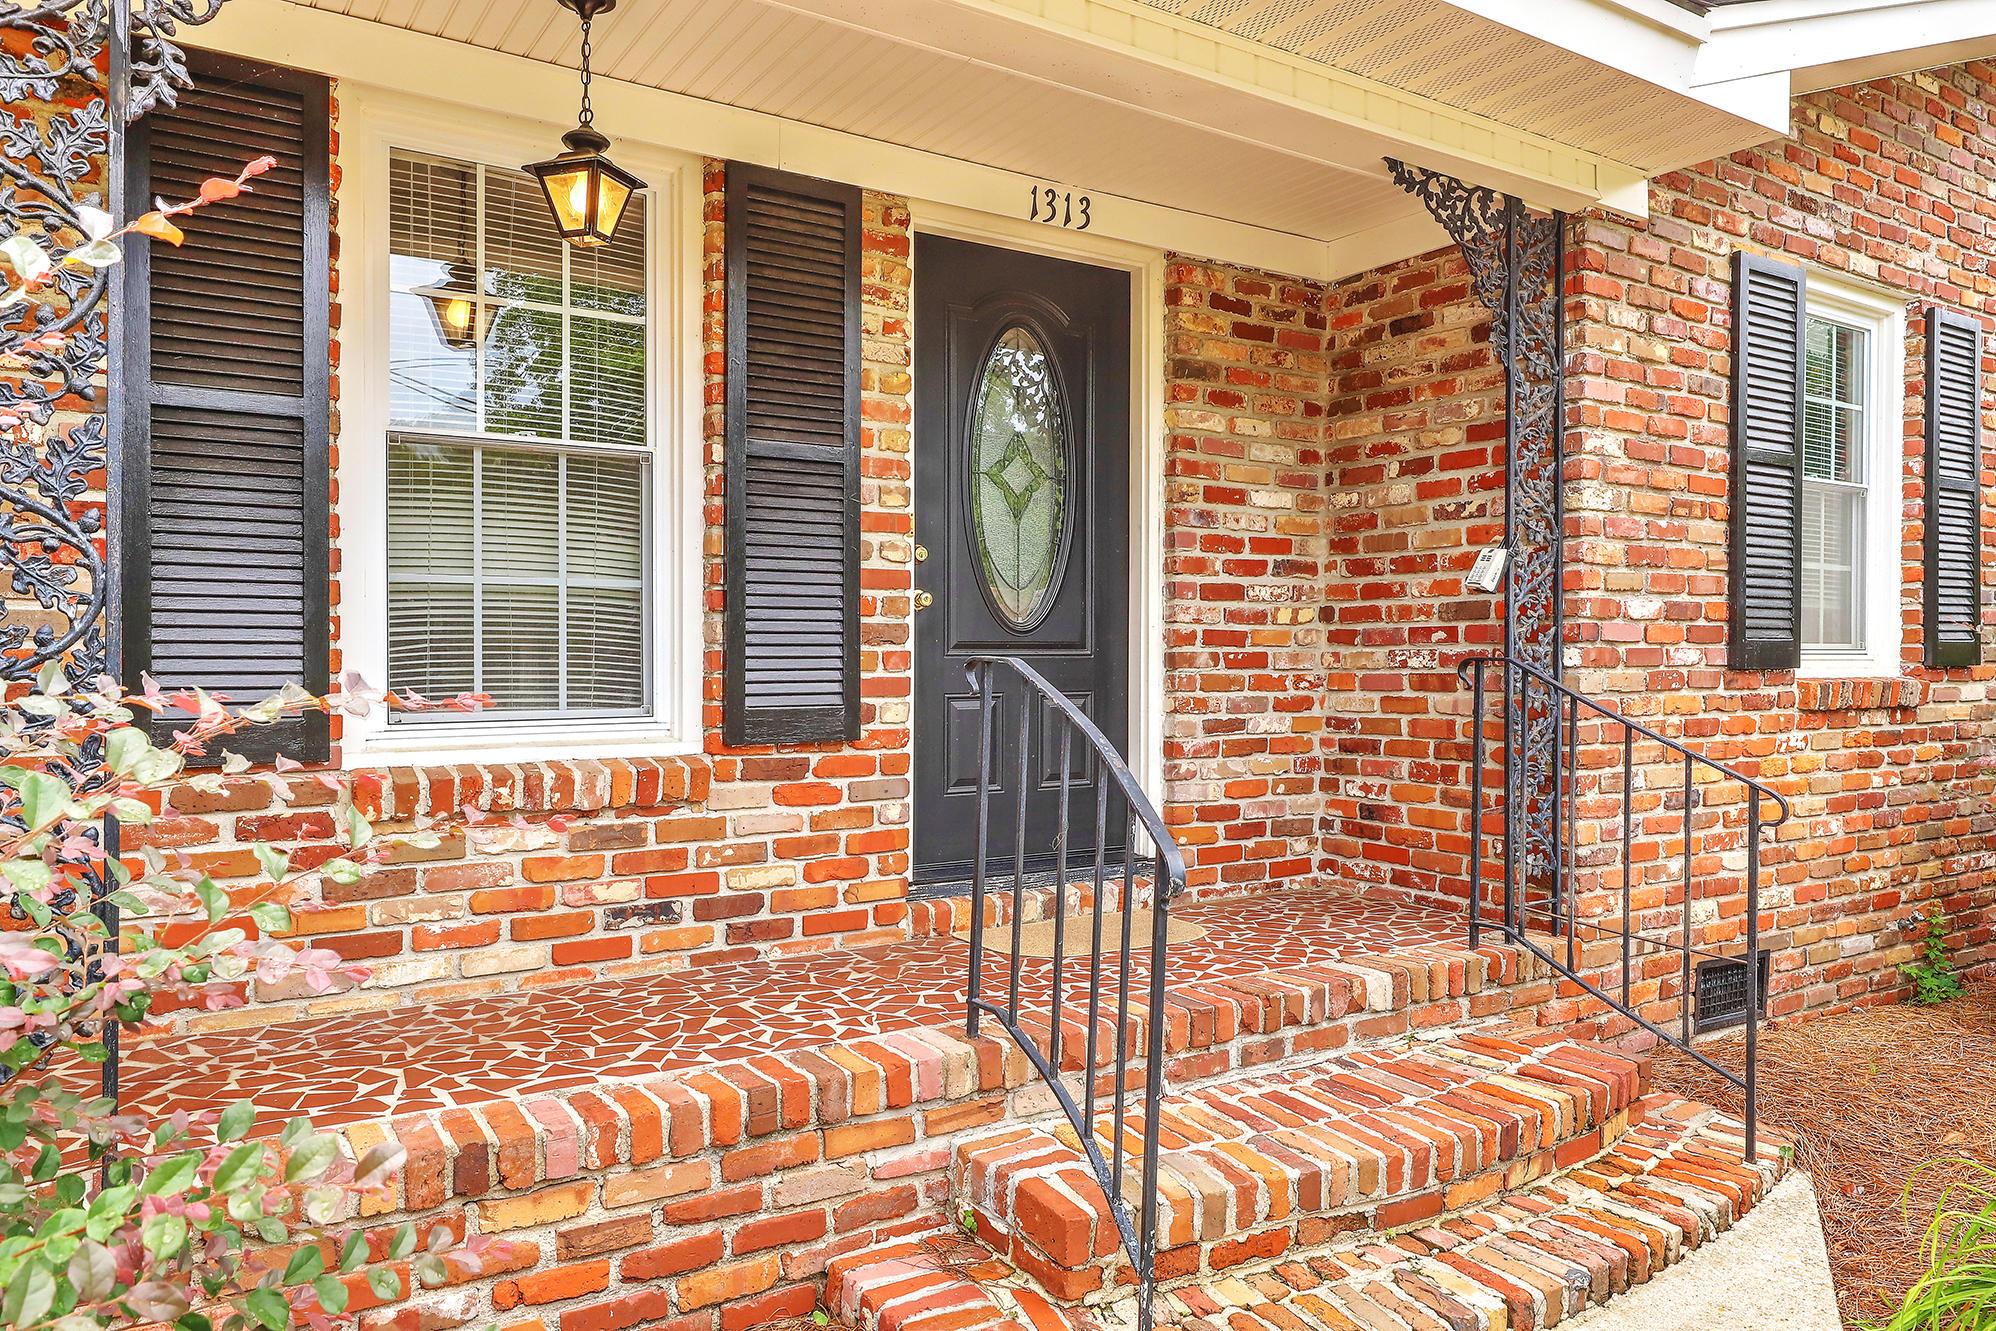 Charlestowne Estates III Homes For Sale - 1313 Coleridge, Charleston, SC - 30